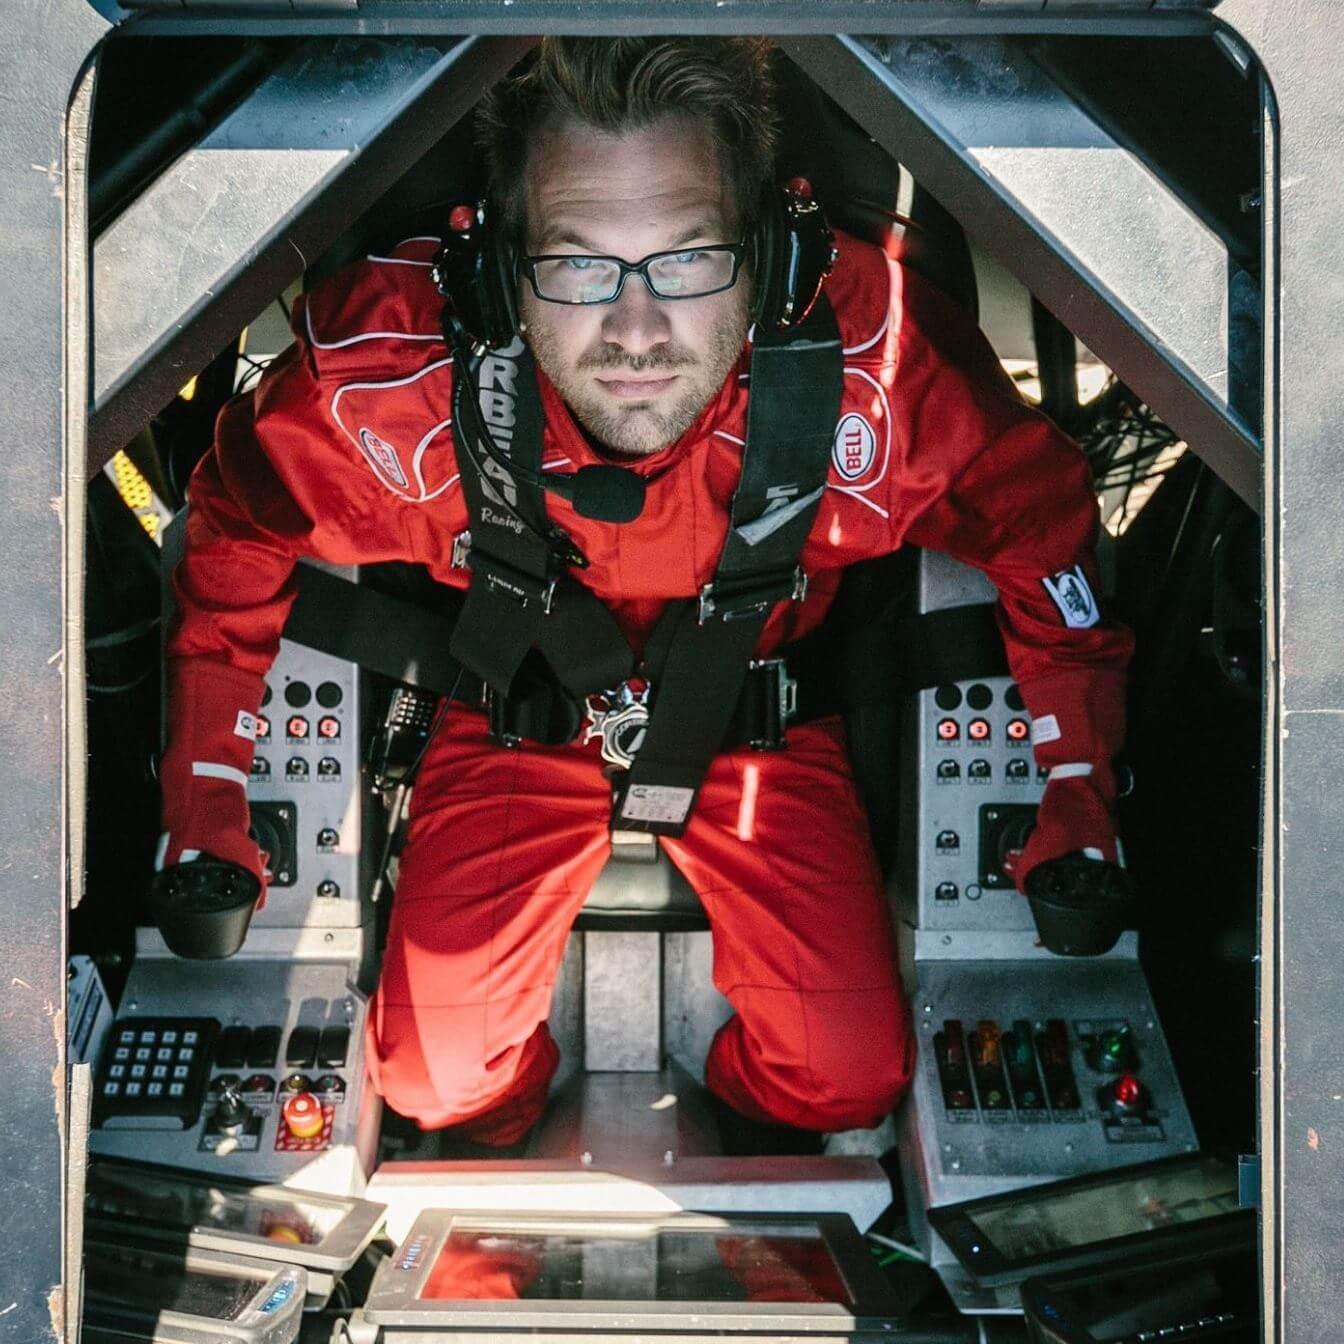 MegaBots-Eagle-Prime-cockpit-Matt-Oehrlein